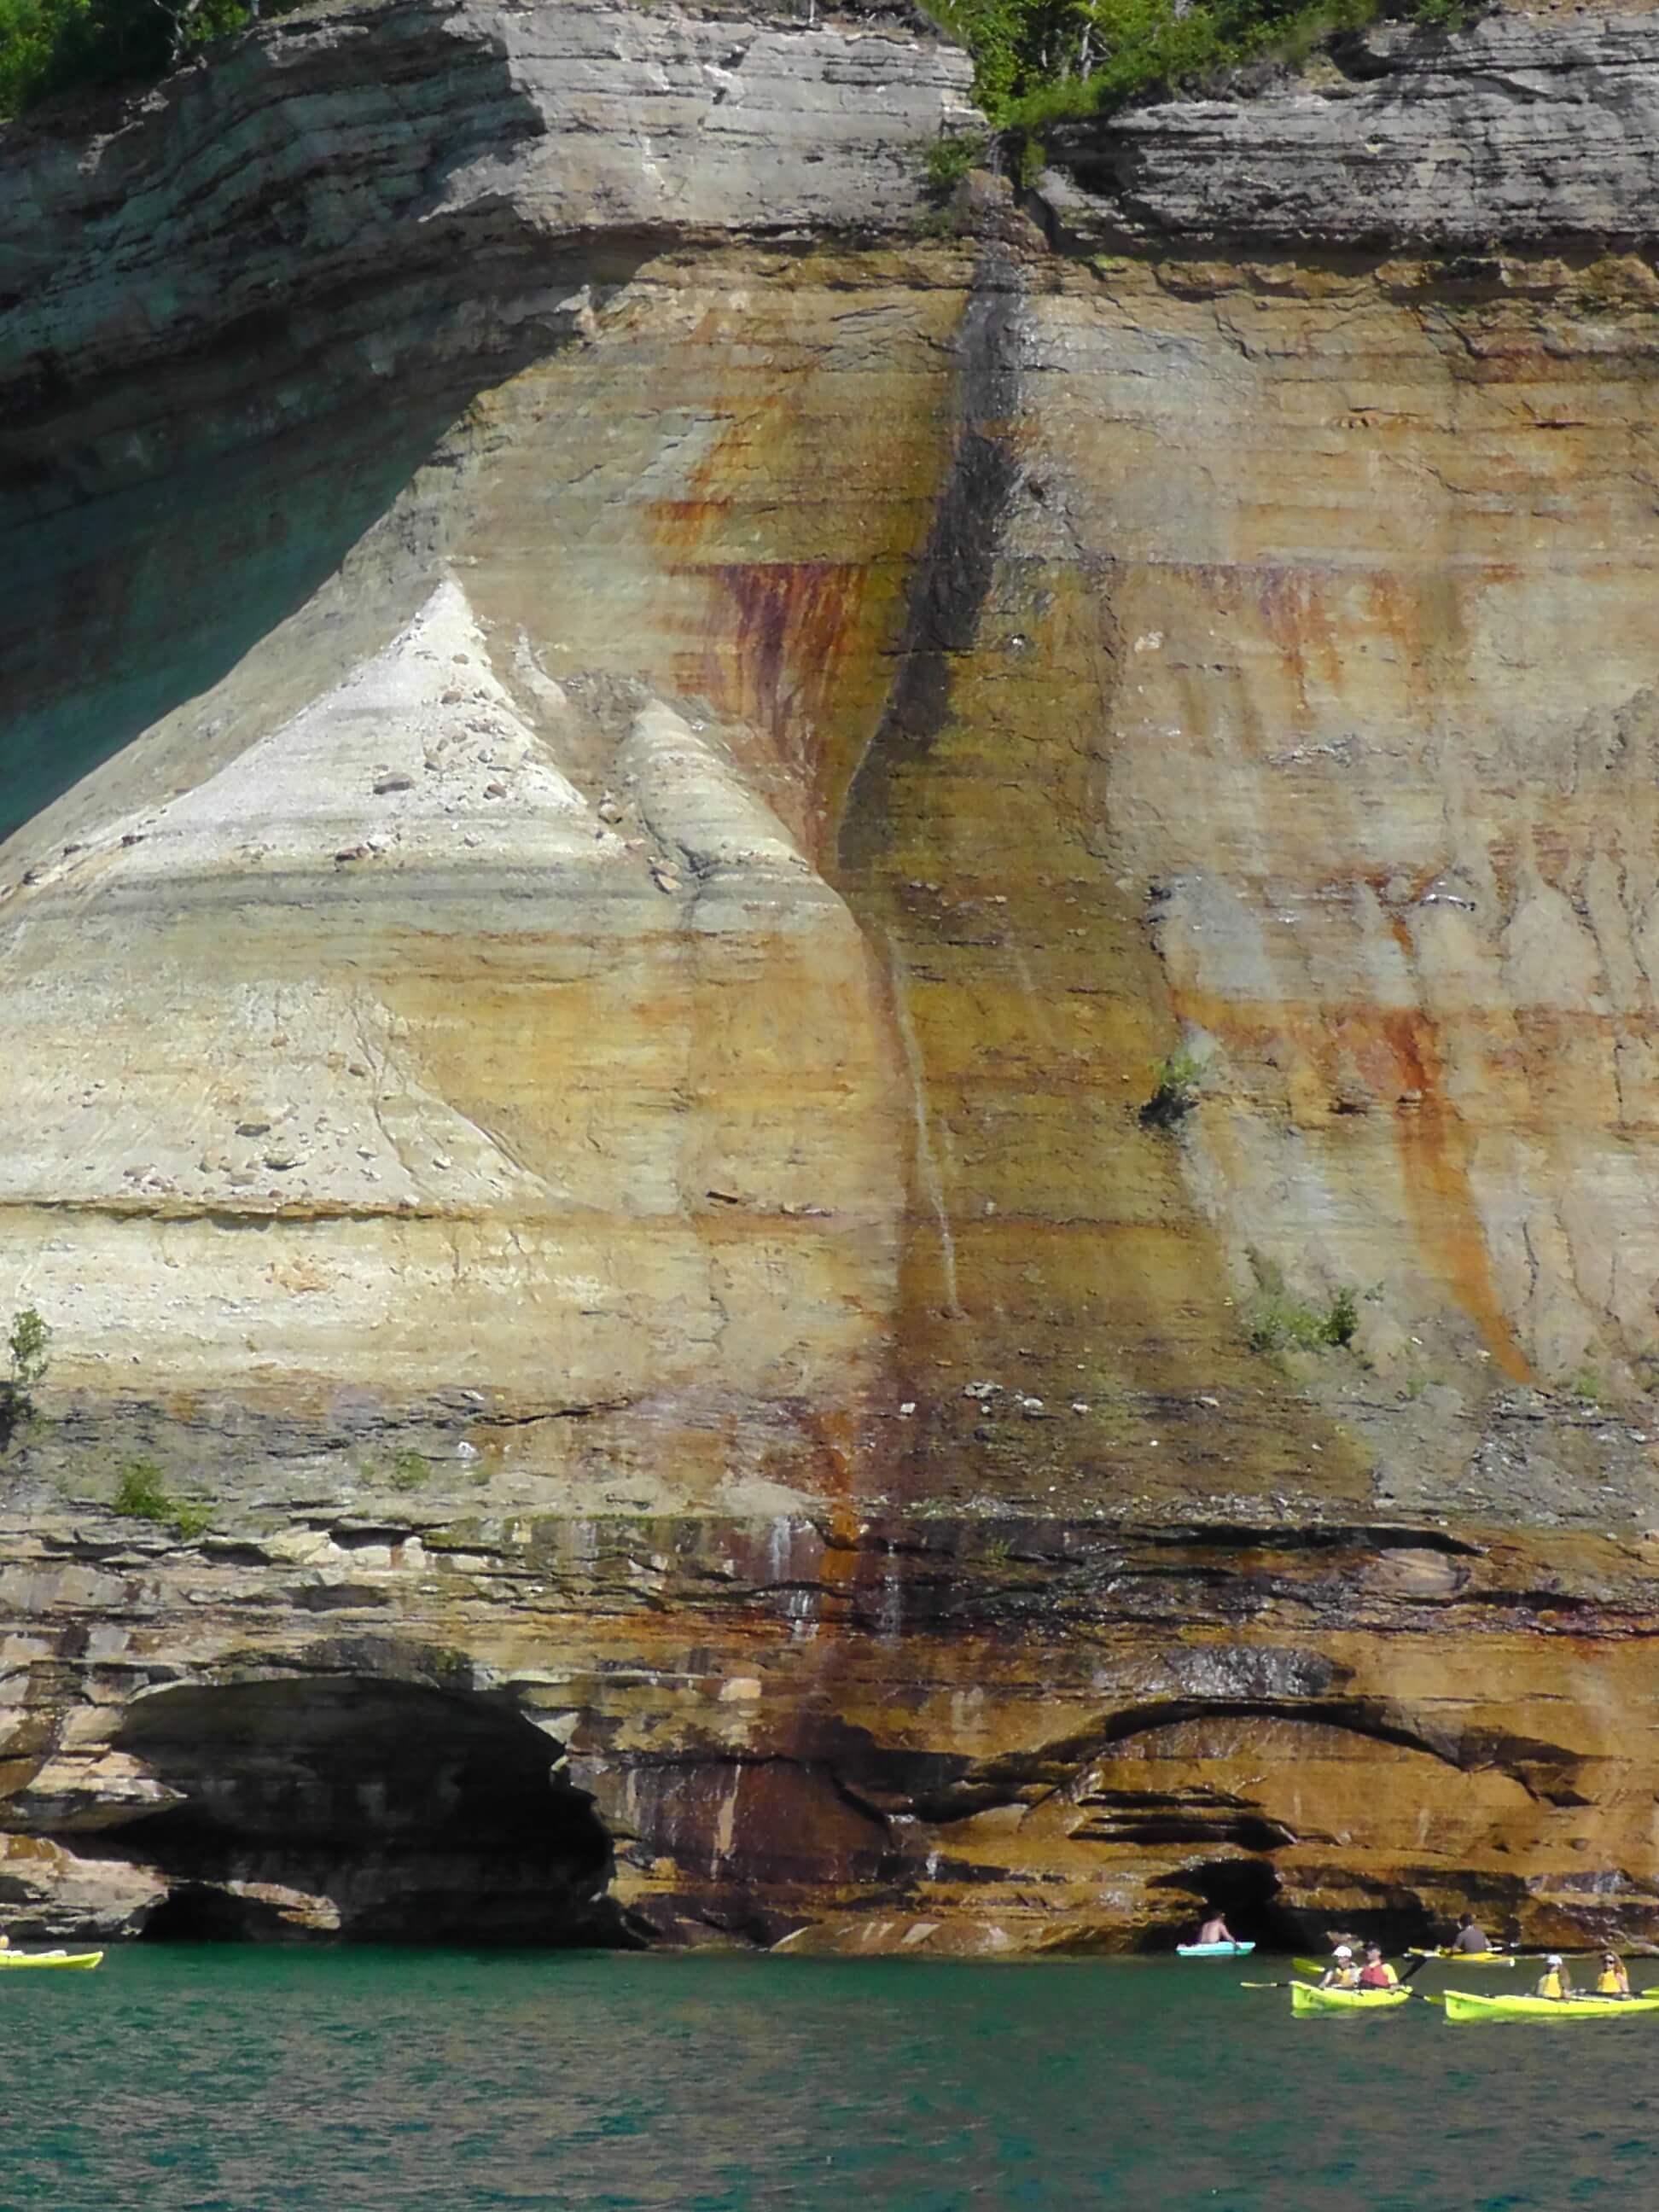 Bridal Veils Falls, Pictured Rocks National Lakeshore